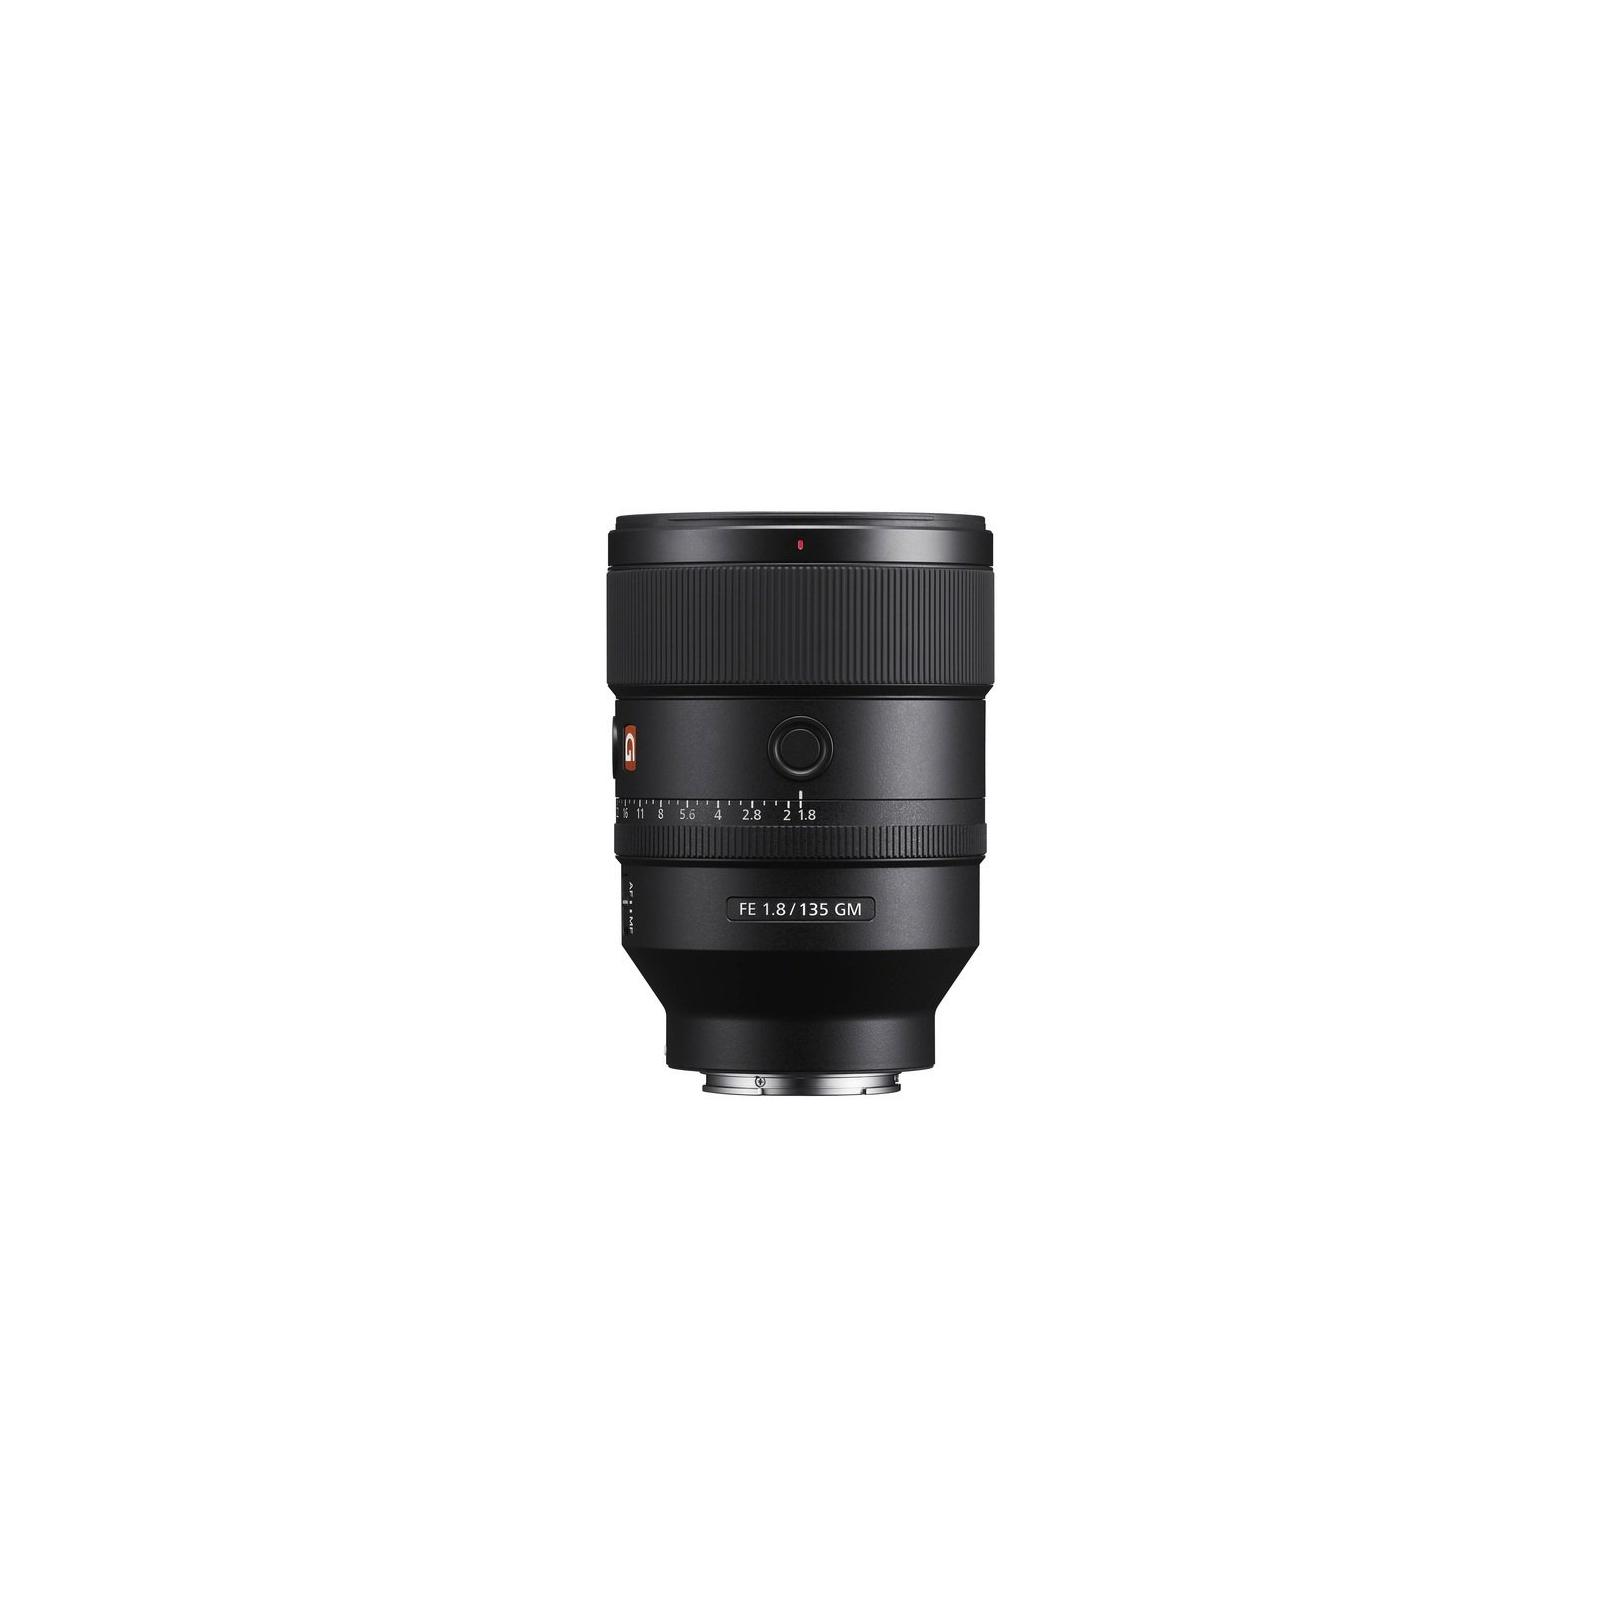 Объектив Sony 135mm, f/1.8 GM для камер NEX FF (SEL135F18GM.SYX) изображение 4